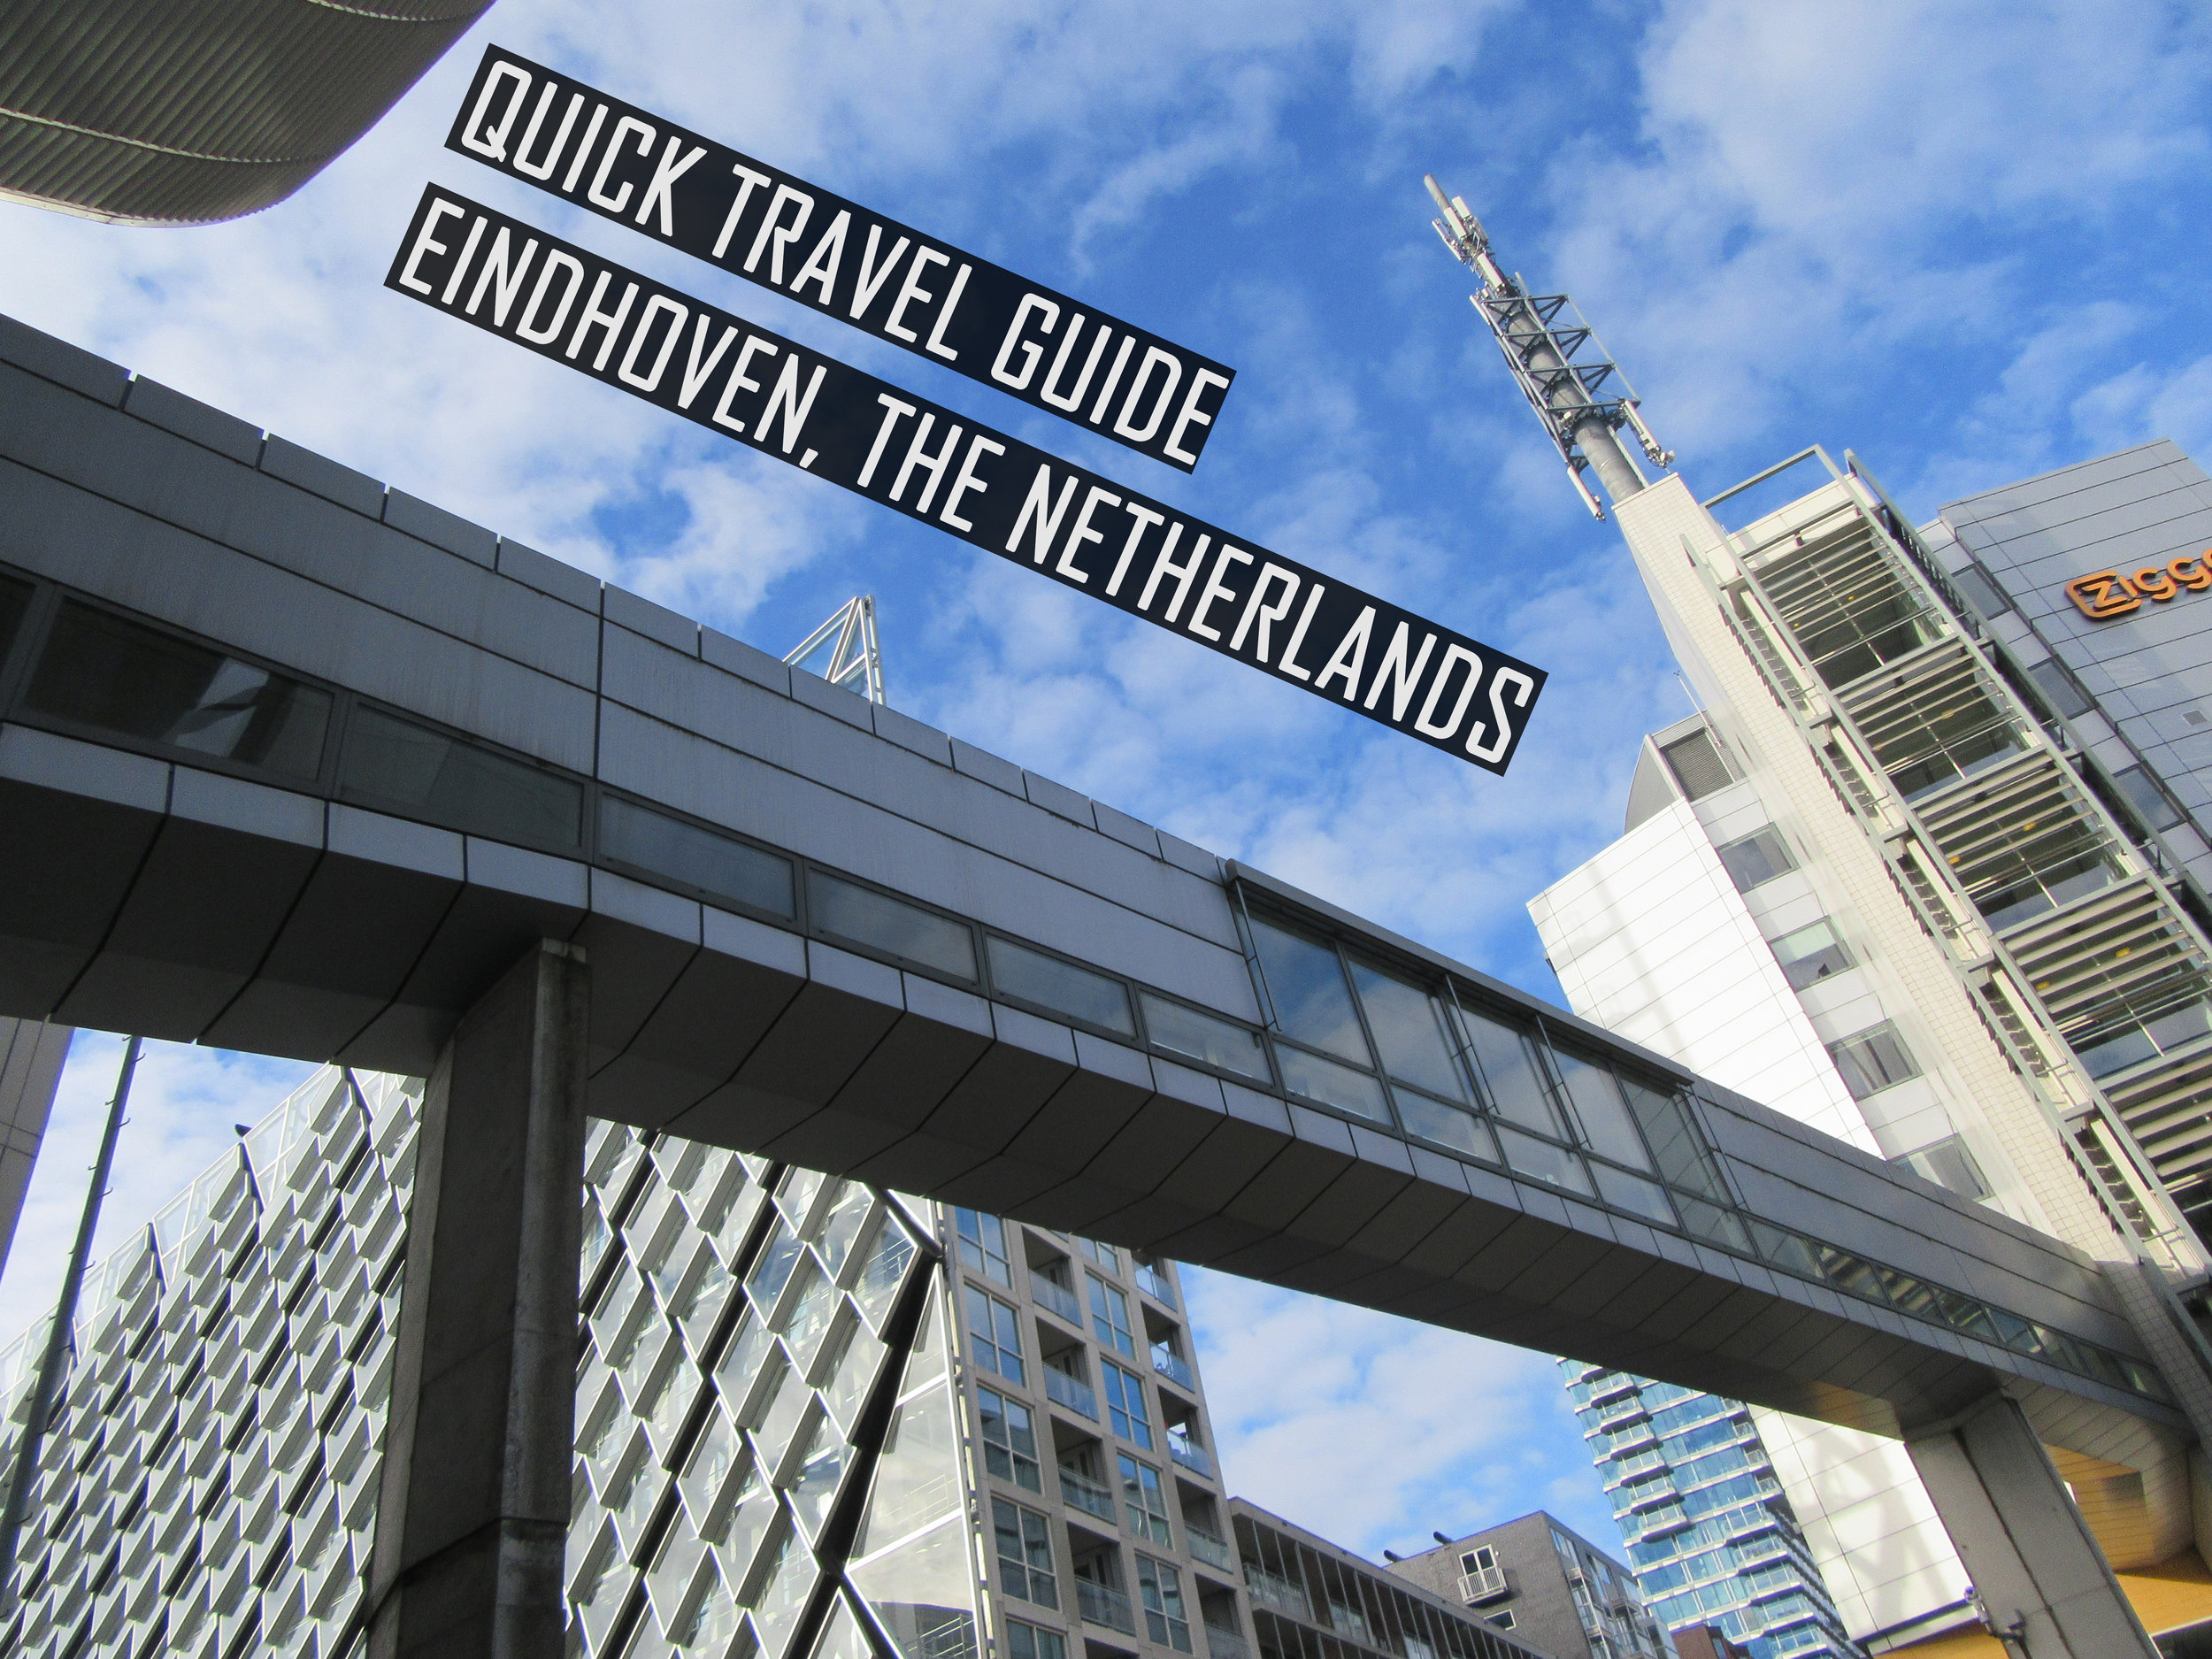 Travel-Guide-Eindhoven-Netherlands